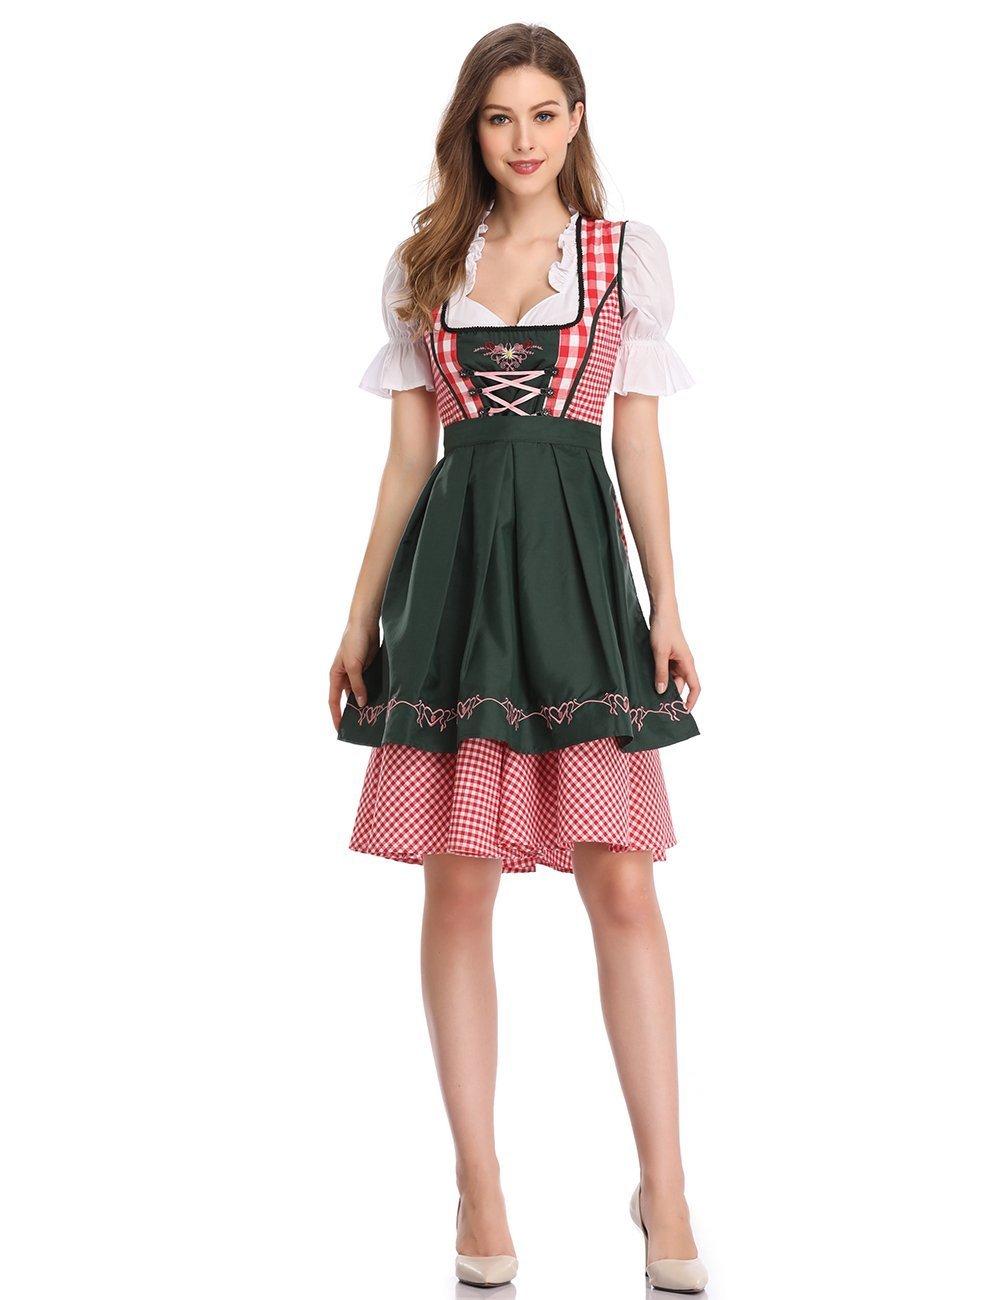 Leoie Women's Oktoberfest Formal Dress Plaid Embroidery Petals Sleeve A Swing Party Dress Suits